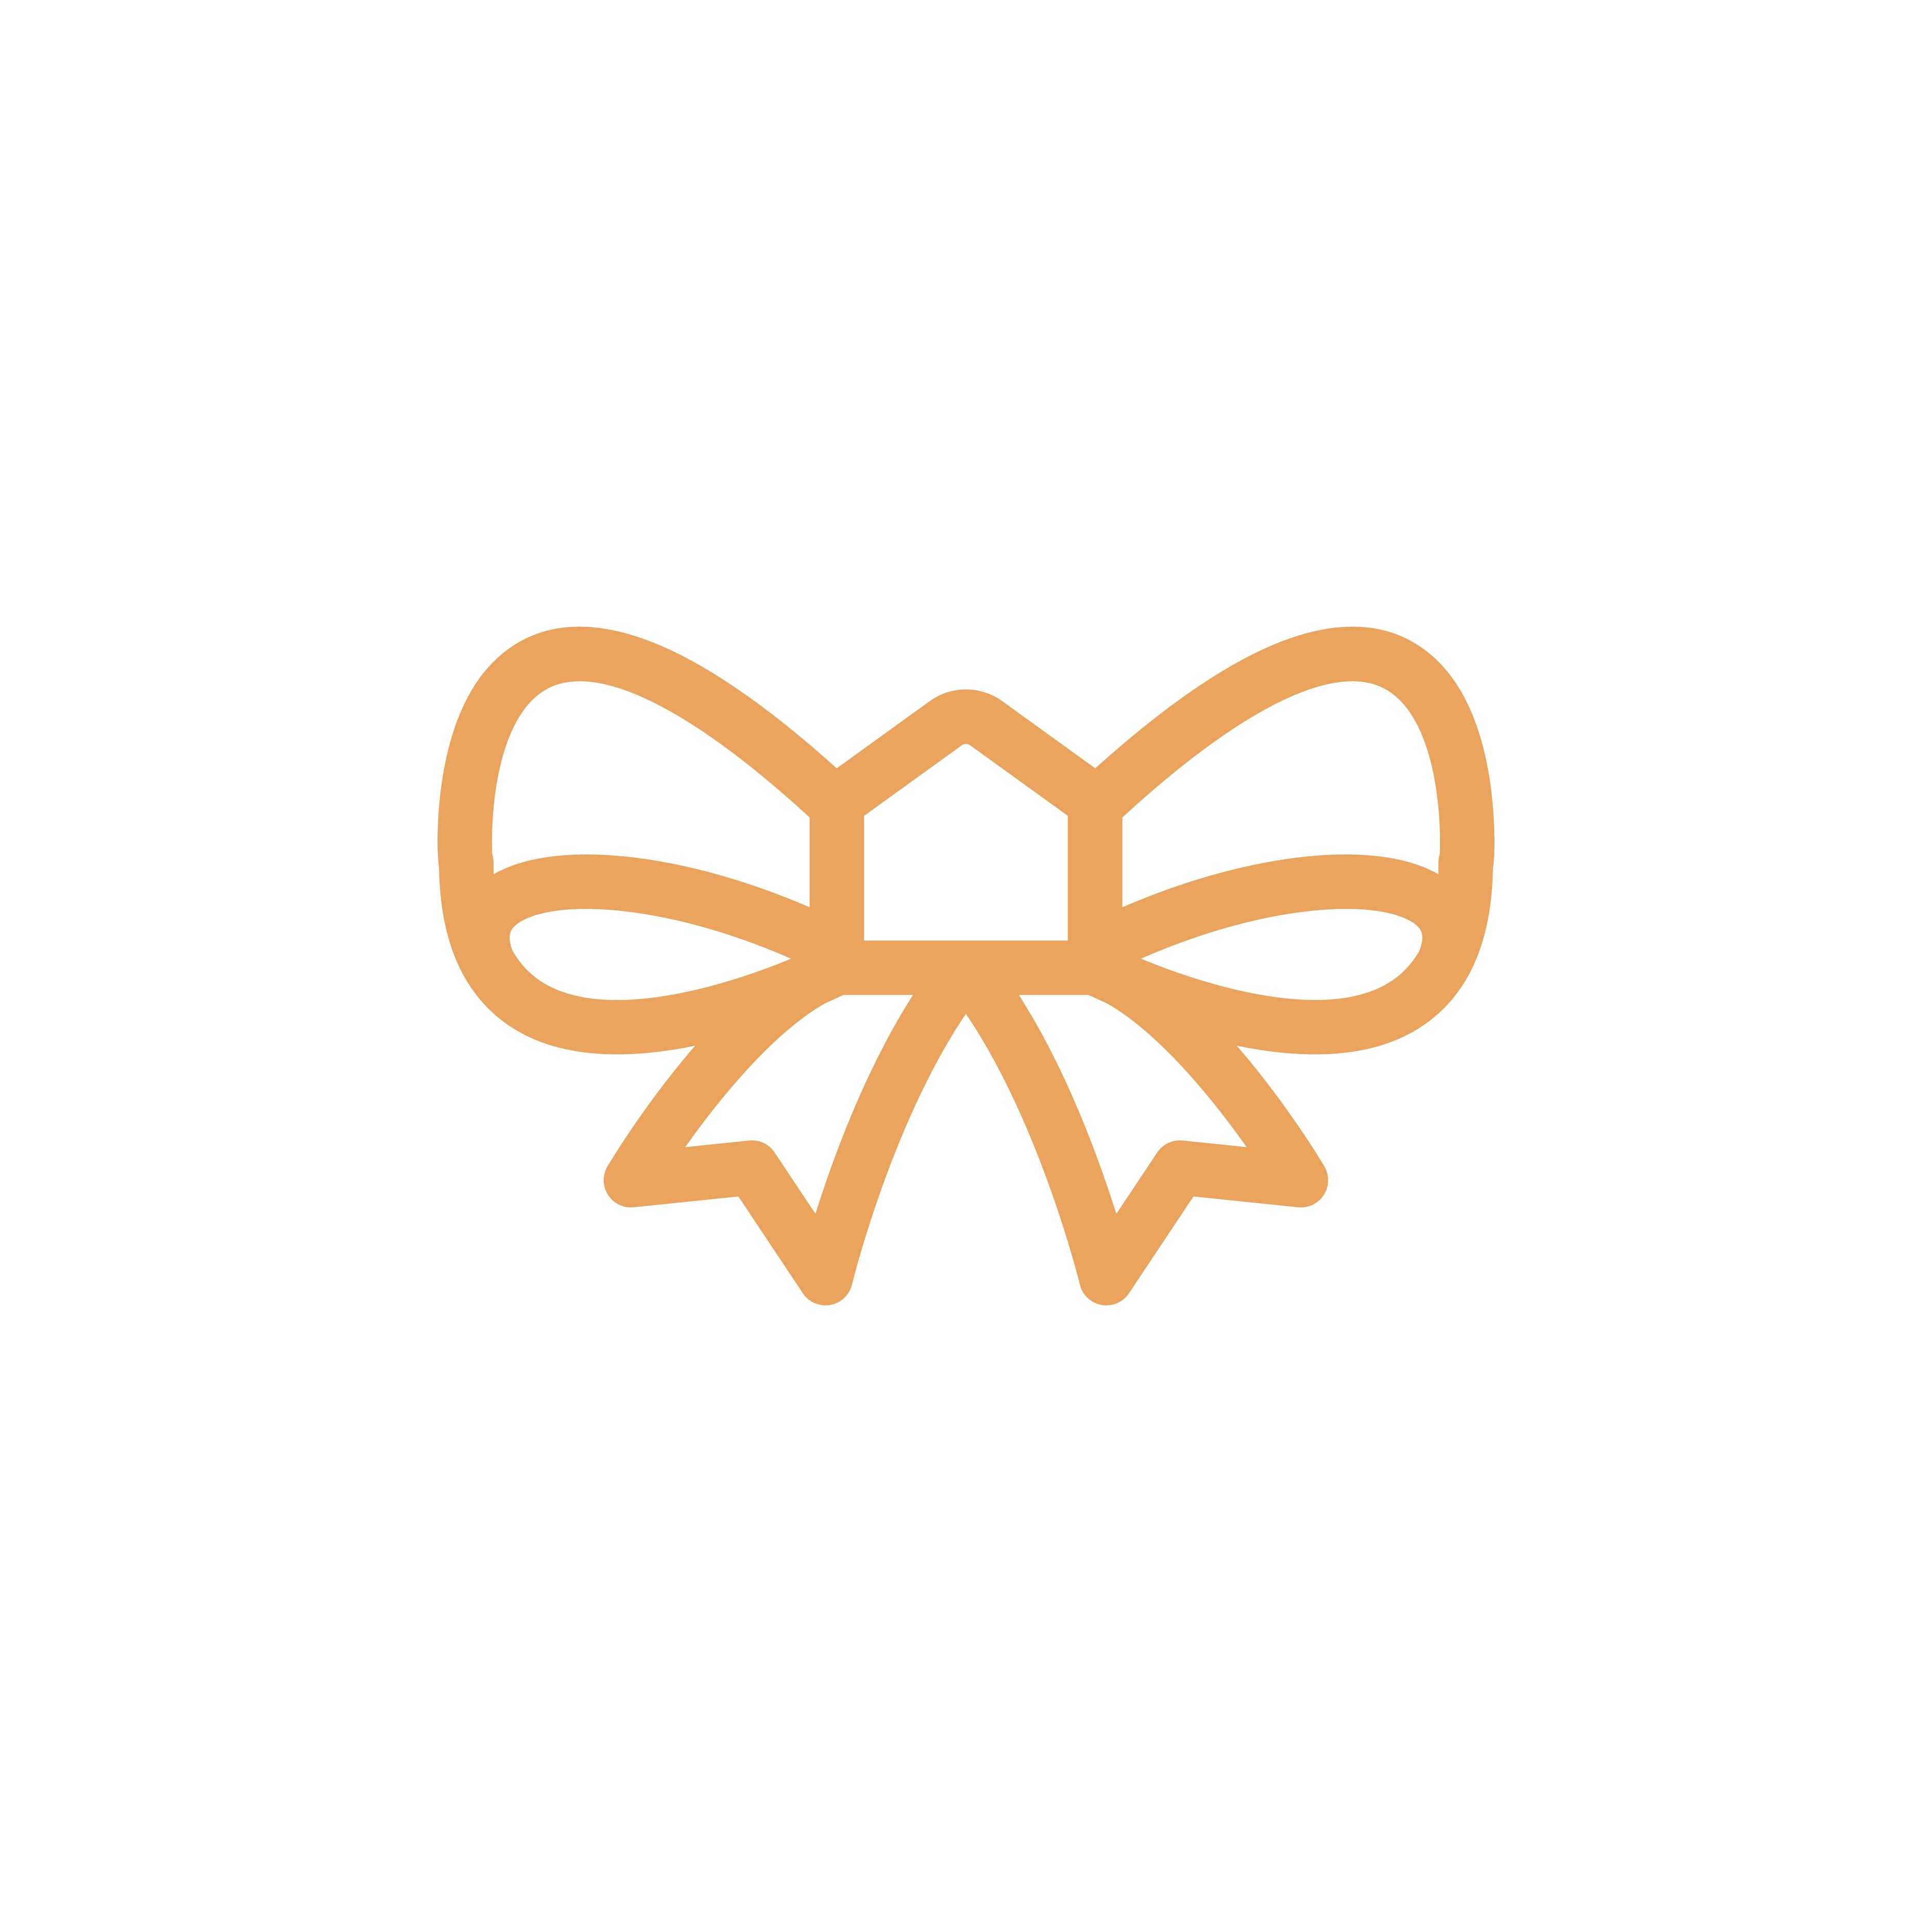 Ribbon Home logo design by logo designer brandclay